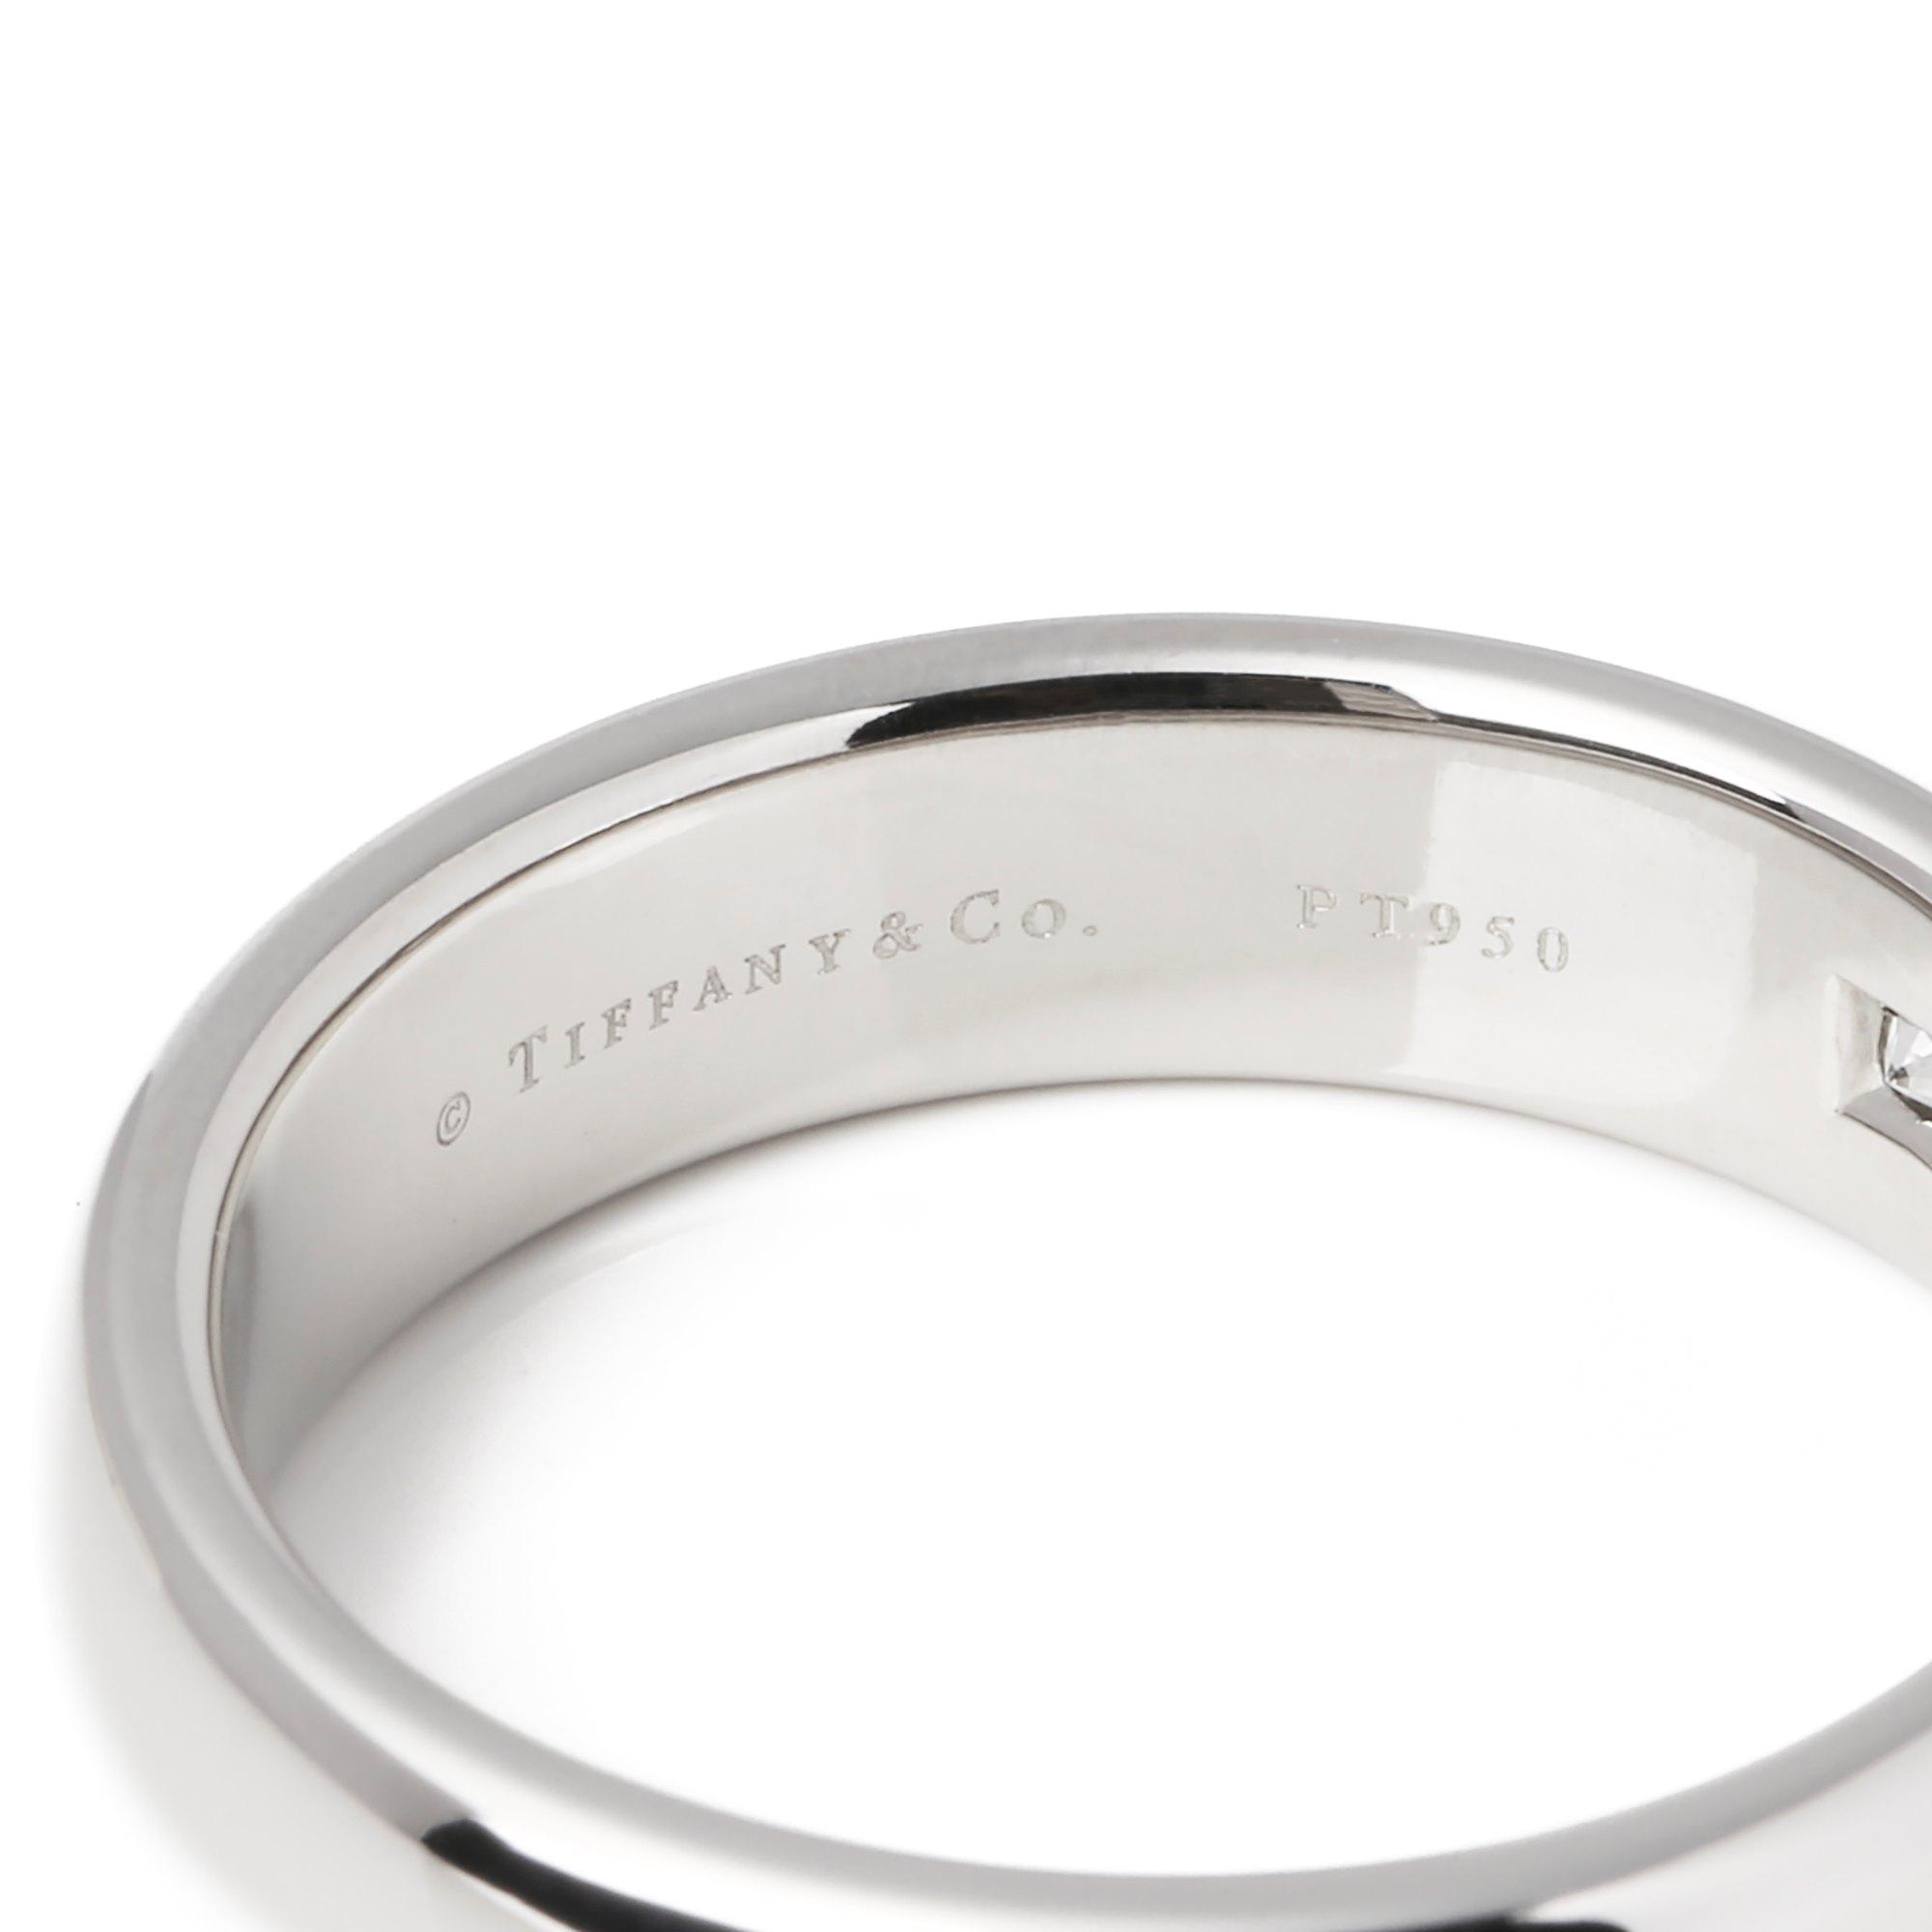 Tiffany & Co. Classic Wedding Band 1 Diamond